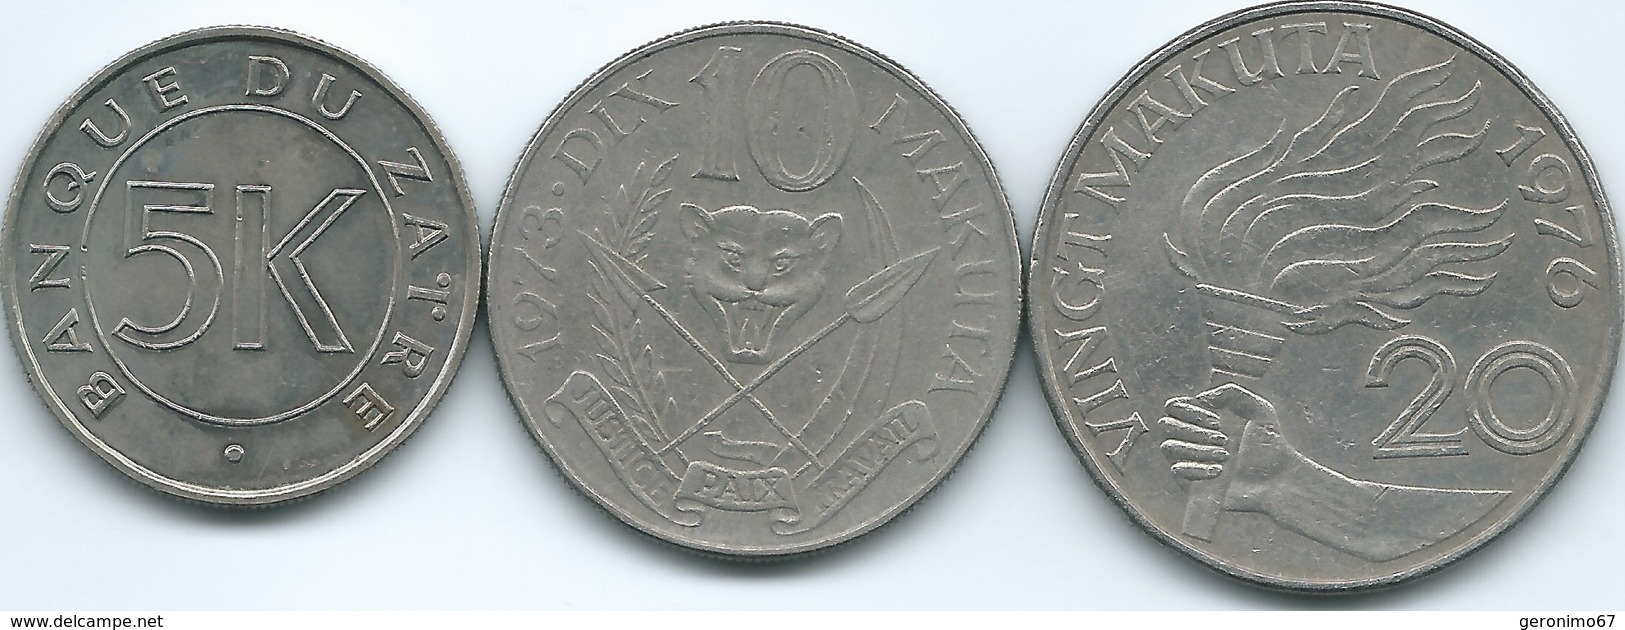 Zaire - 5 Makuta - 1977 (KM12); 10 Makuta - 1973 (KM7) & 20 Makuta - 1976 (KM8) - Zaire (1971-97)